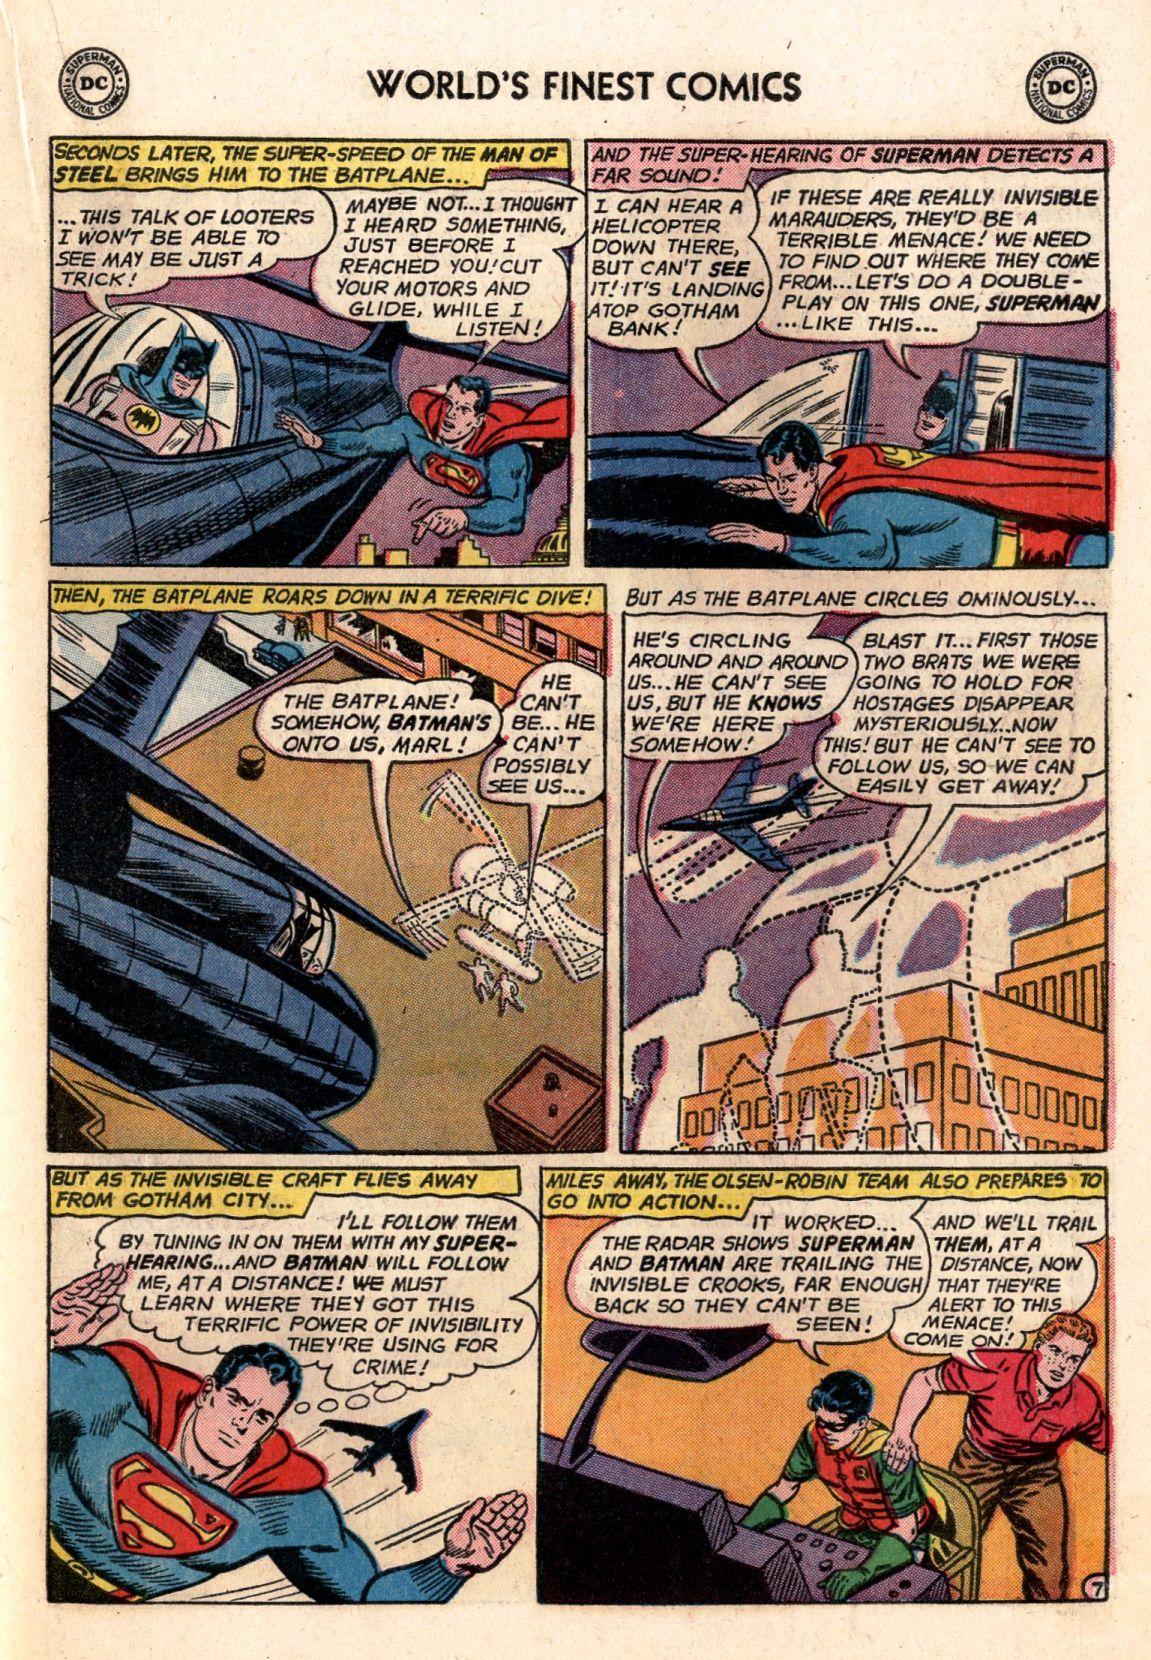 Read online World's Finest Comics comic -  Issue #141 - 19